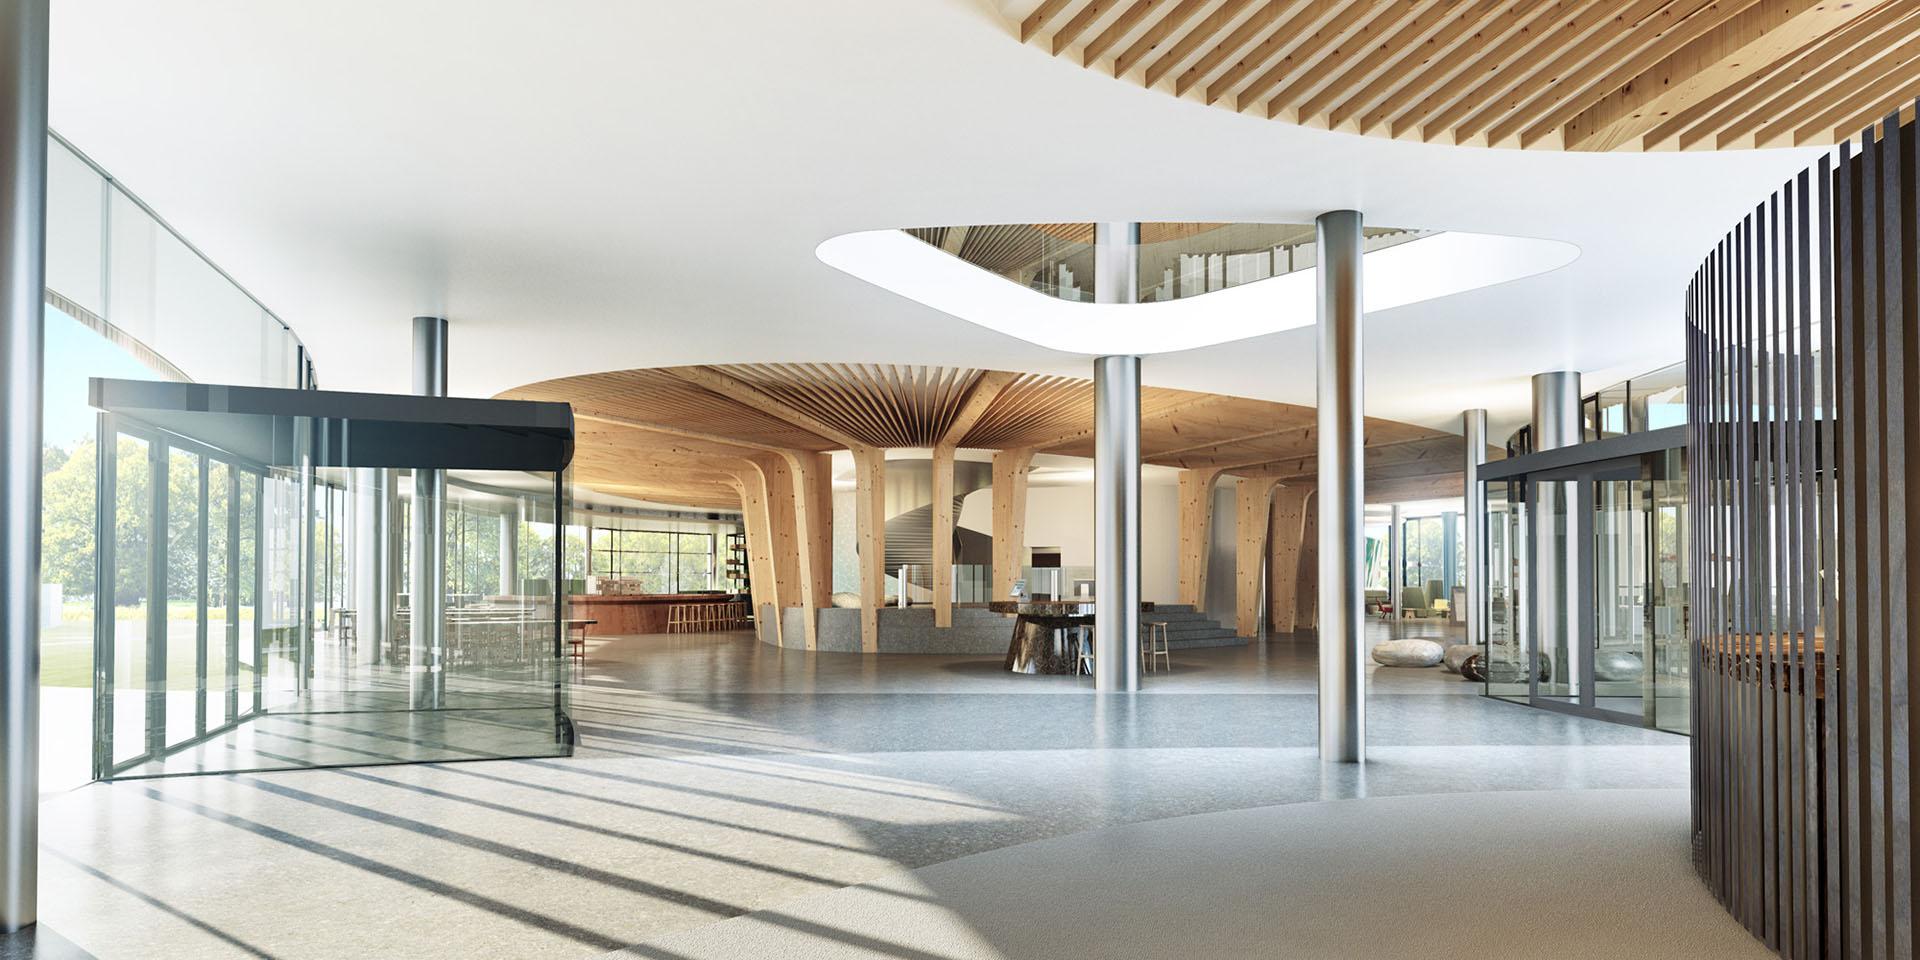 2_RAU003_1 - RAU architecten - Triodos_Interieur_fr5